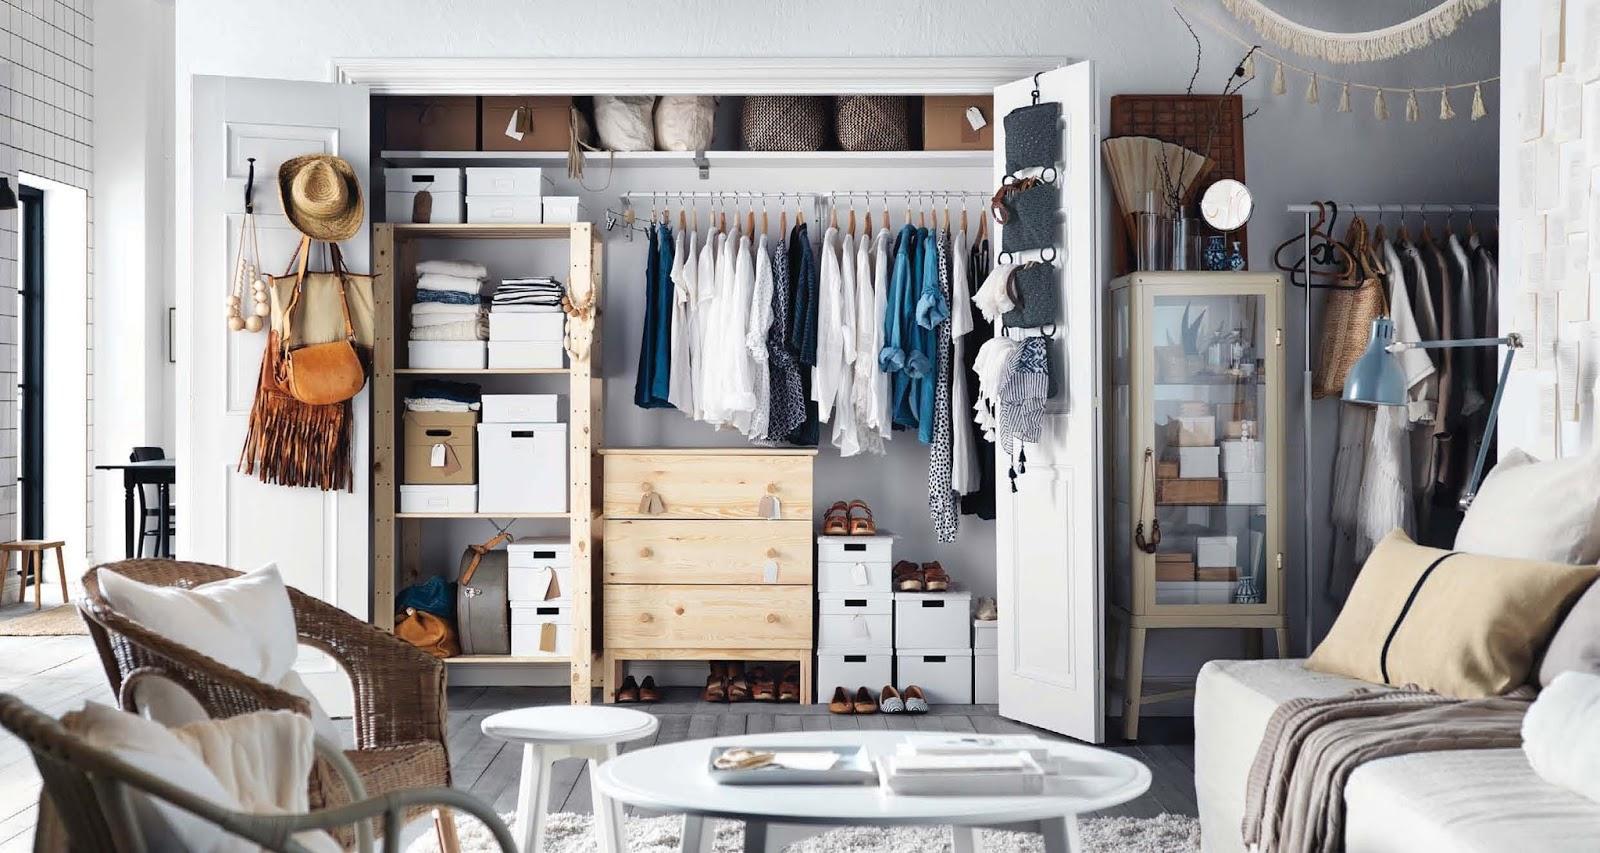 katalog ikea 2016 bajkowe wn trza. Black Bedroom Furniture Sets. Home Design Ideas